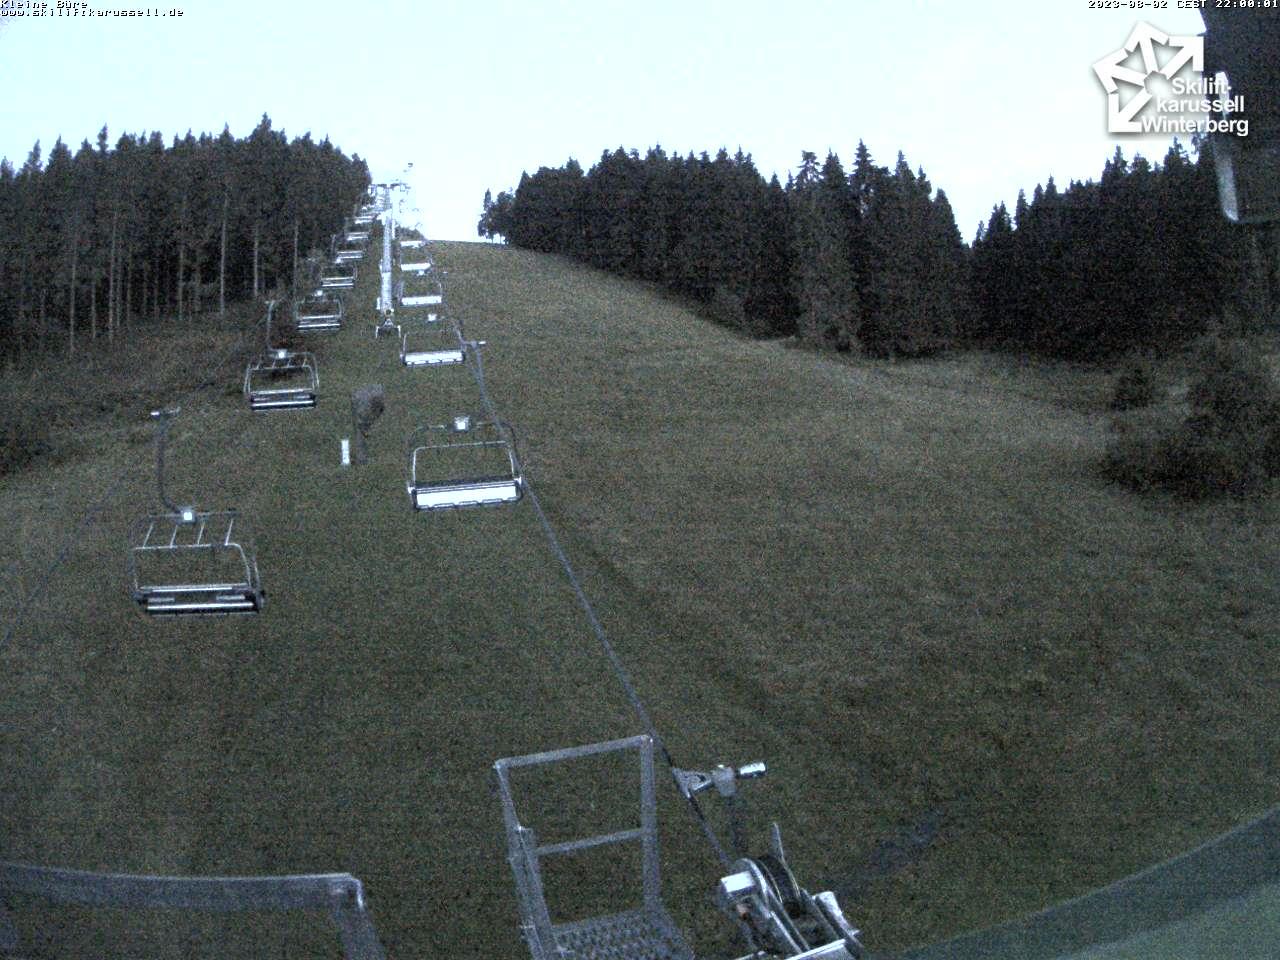 Skiliftkarussell Winterberg - Webcam 10